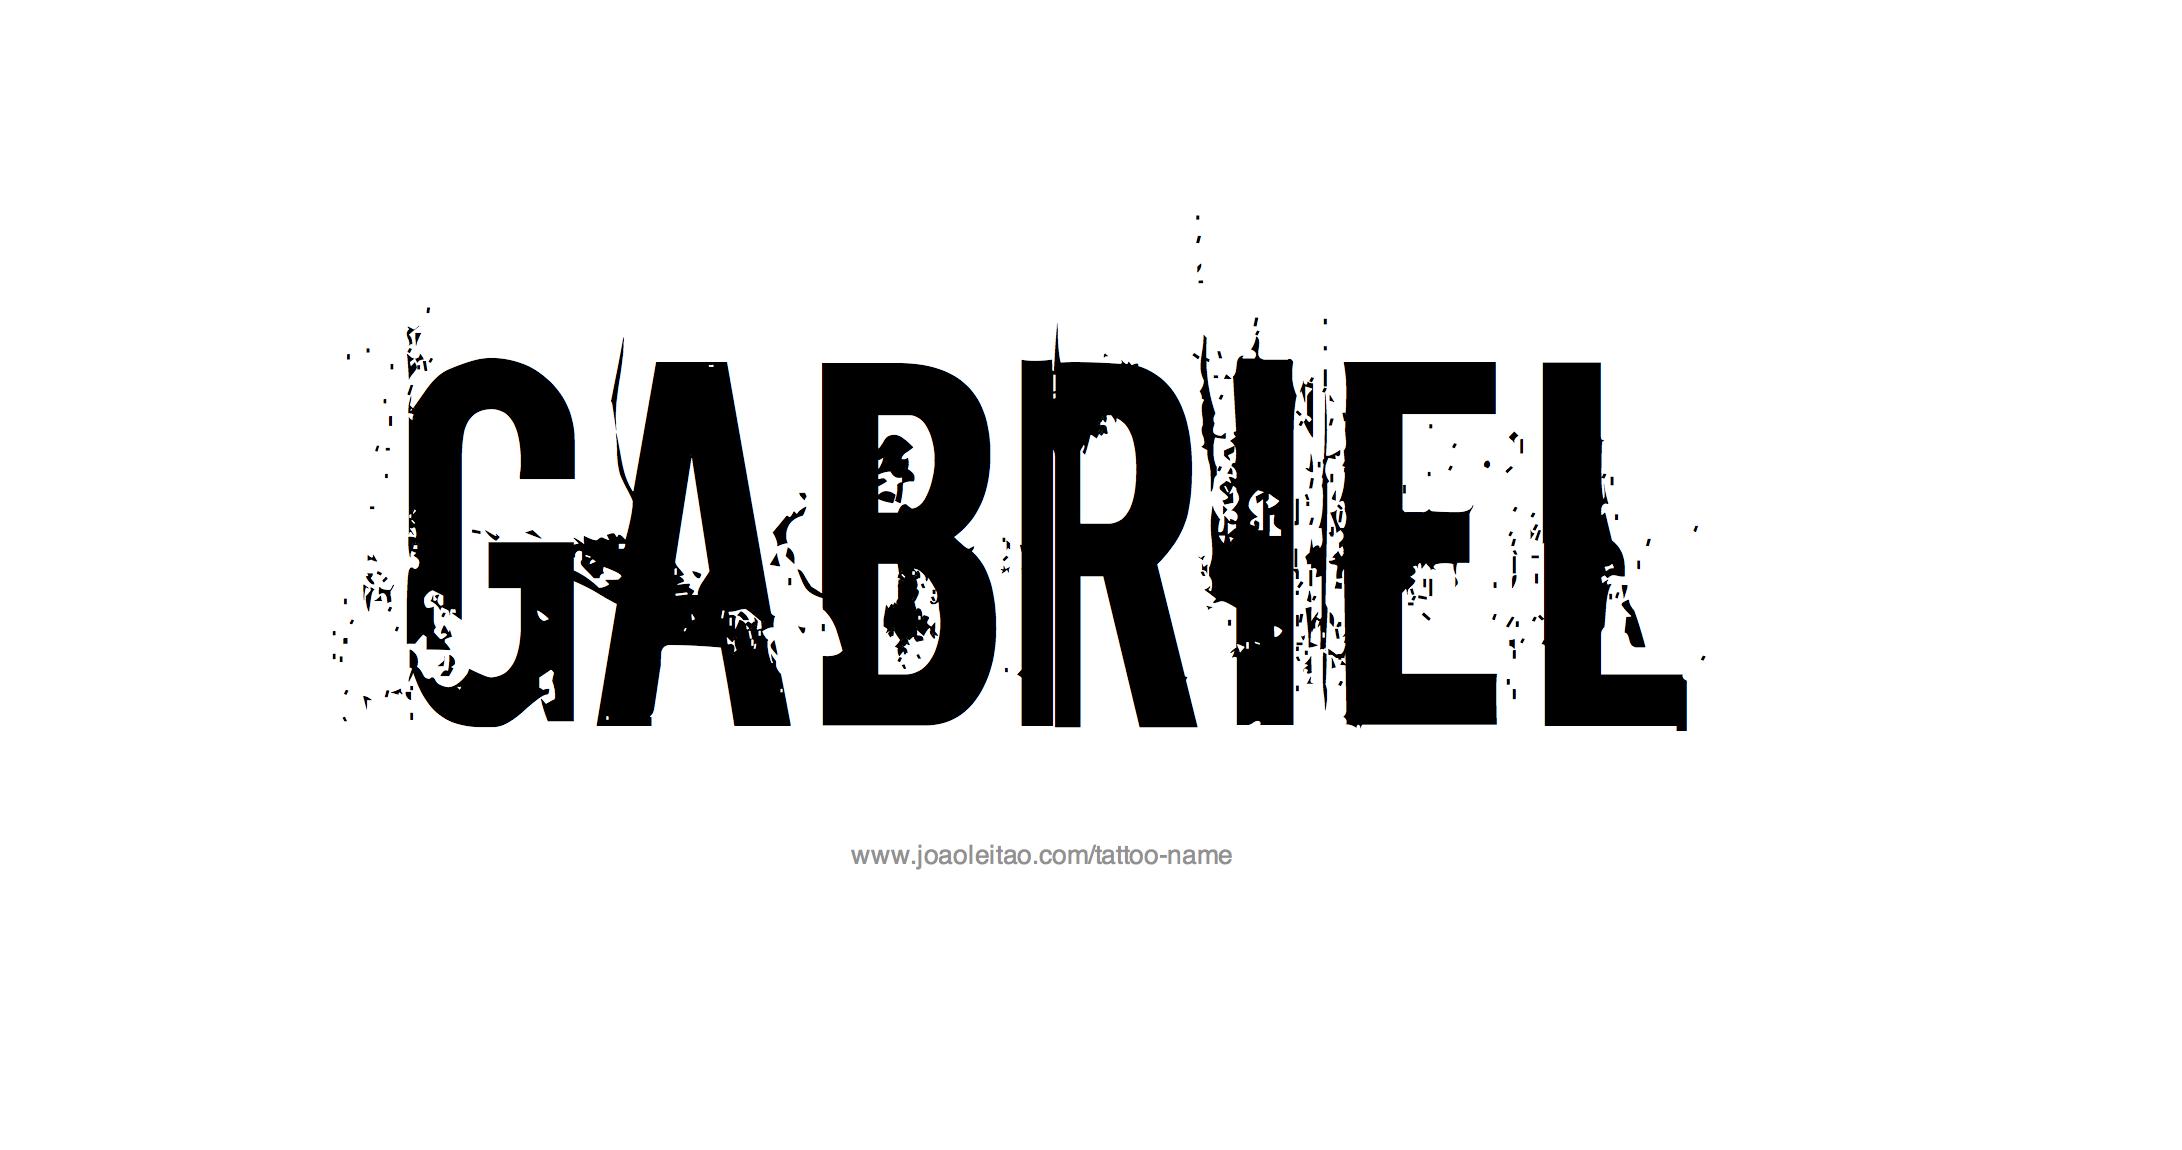 Gabriel Name Tattoo Designs Name Tattoo Designs Tattoo Designs Name Tattoos